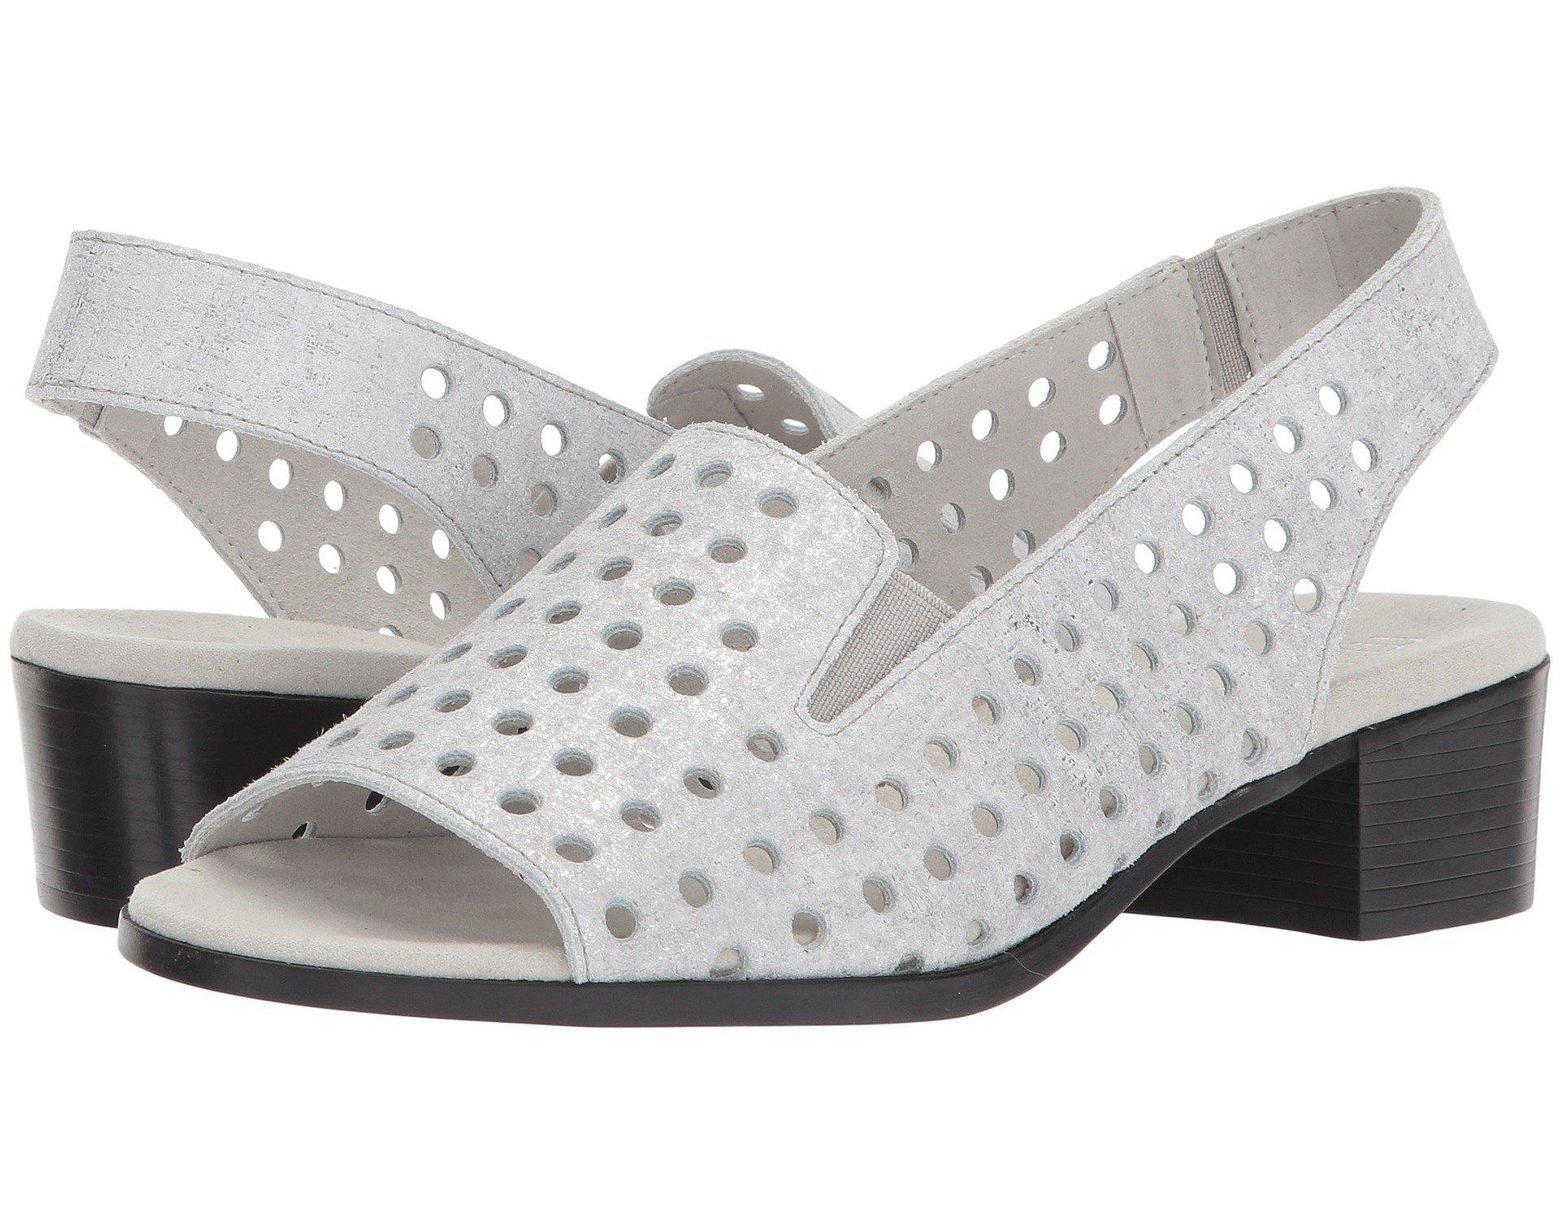 e61b828f1200 Lyst - Munro Mickee (black Nubuck) Women s Sandals in Metallic